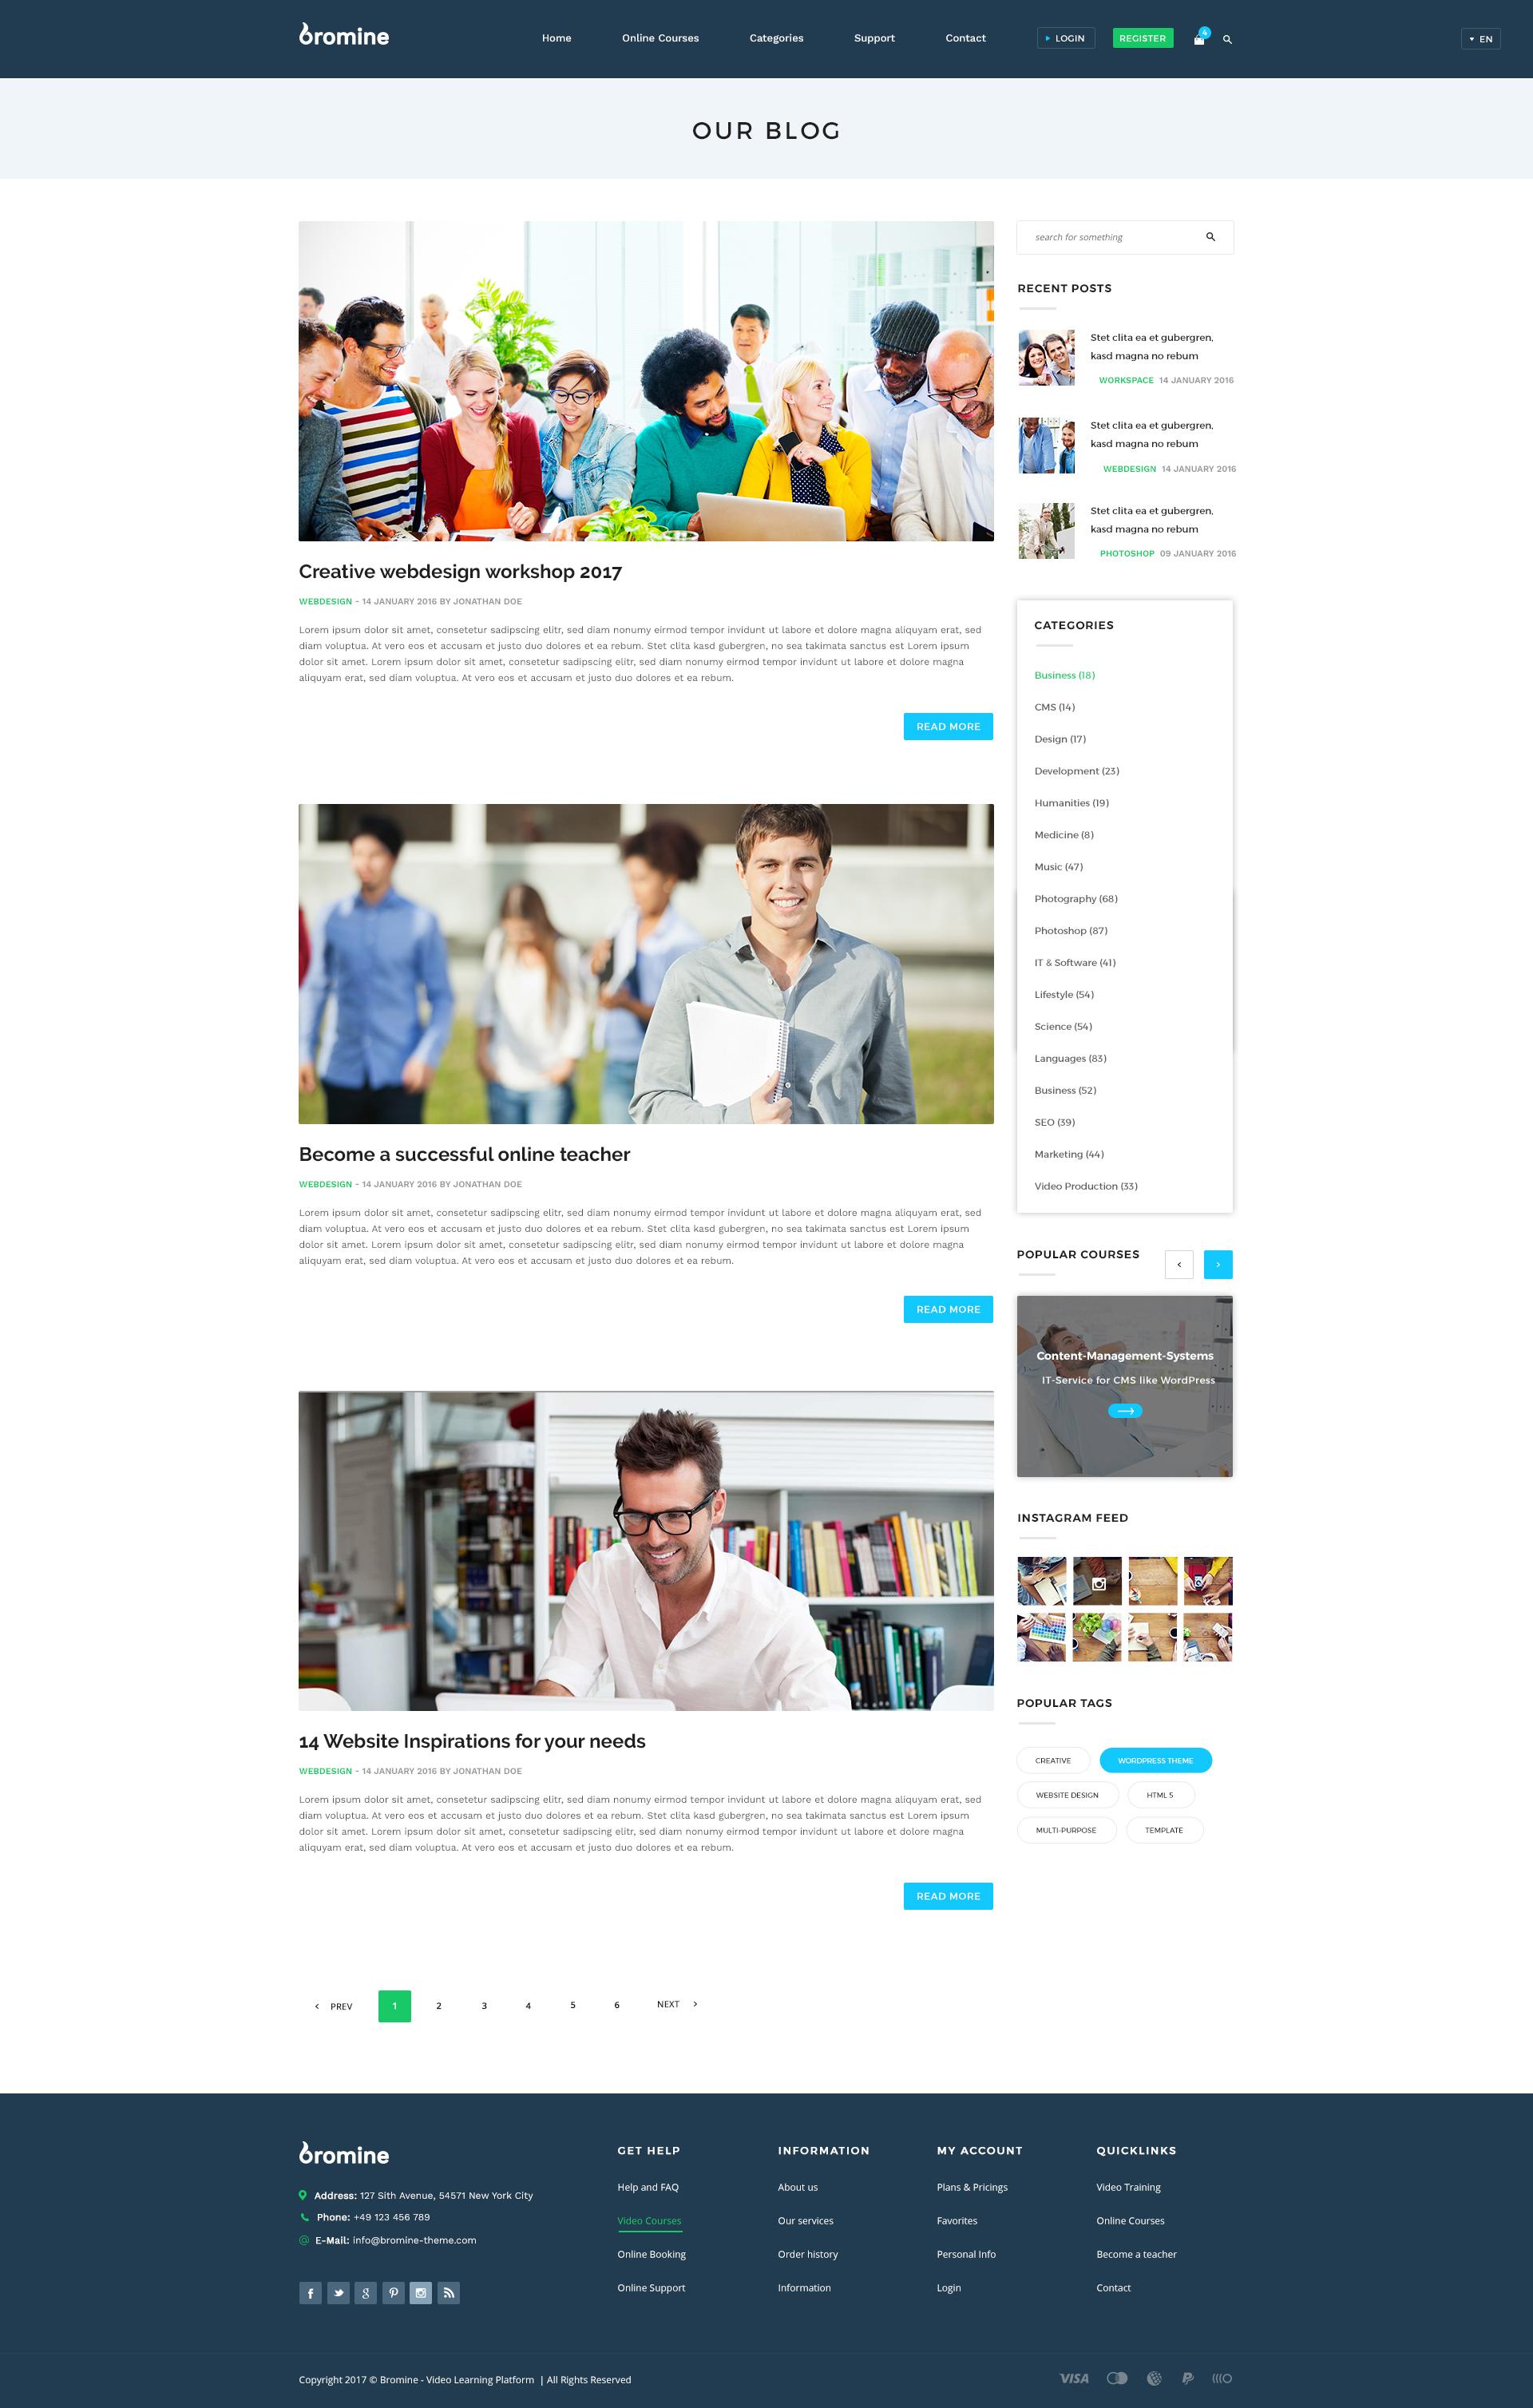 Bromine - Online Learning Platform PSD template by KL-Webmedia ...